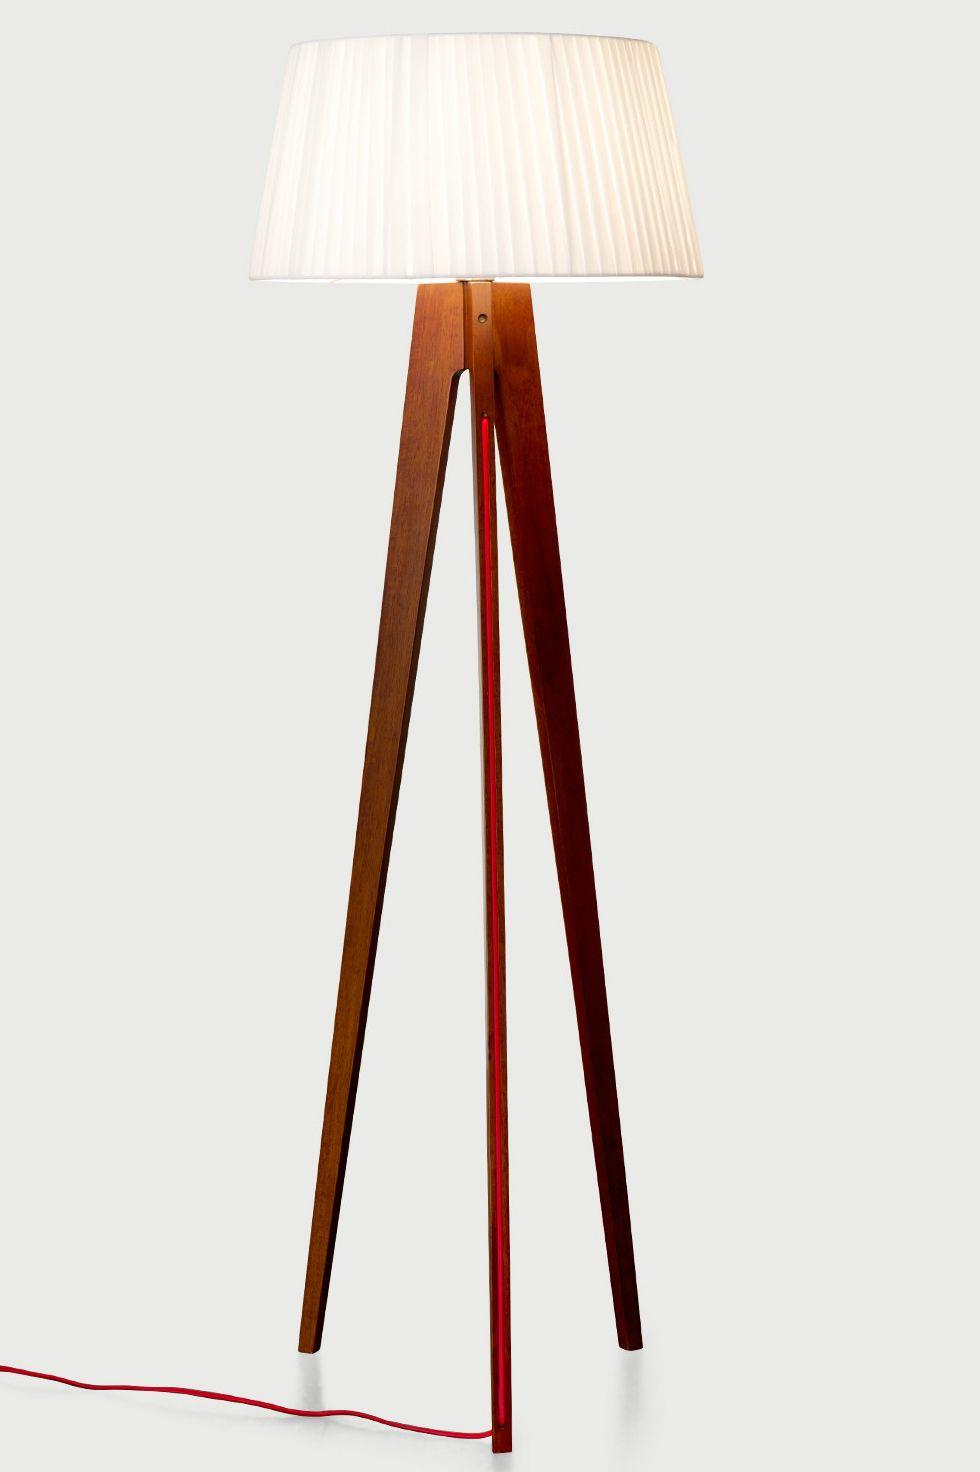 rote stehlampe rote stehlampe von arredoluce er with rote. Black Bedroom Furniture Sets. Home Design Ideas